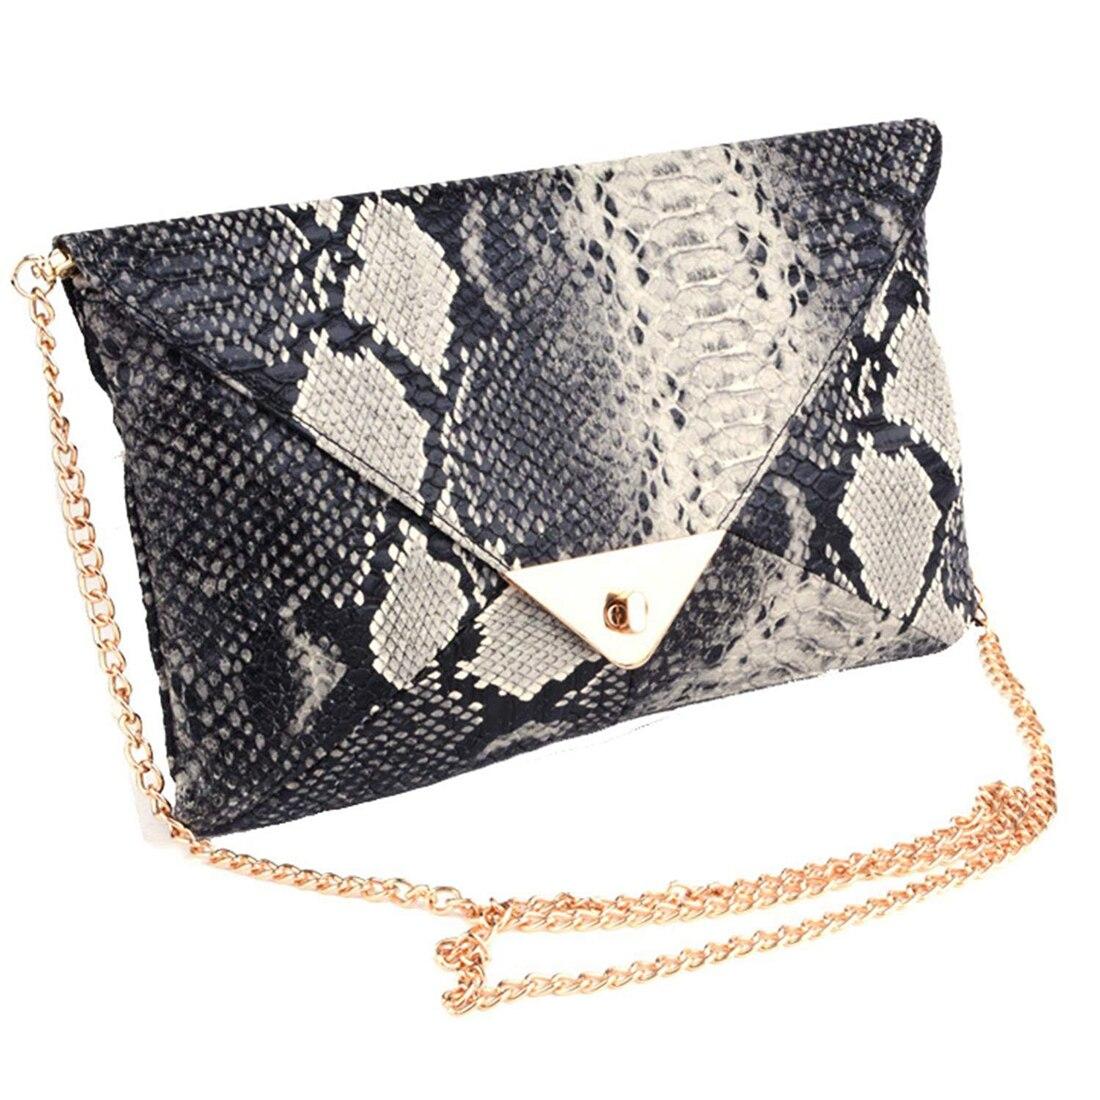 Women's Snake skin Print Accent Envelope Statement Clutch Bag